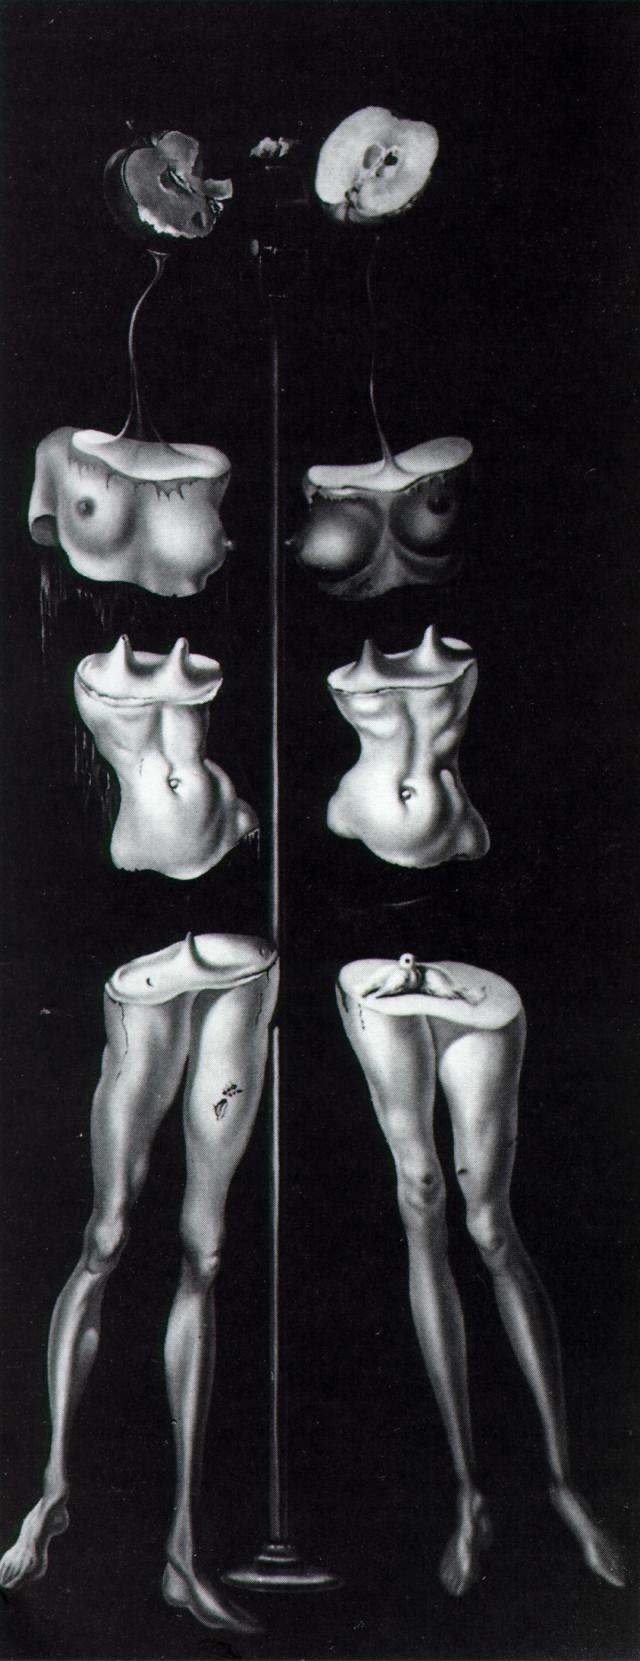 ~ Untitled - Set Design (Figures Cut in Three), by Salvador Dali - 1942 - Surrealism ~